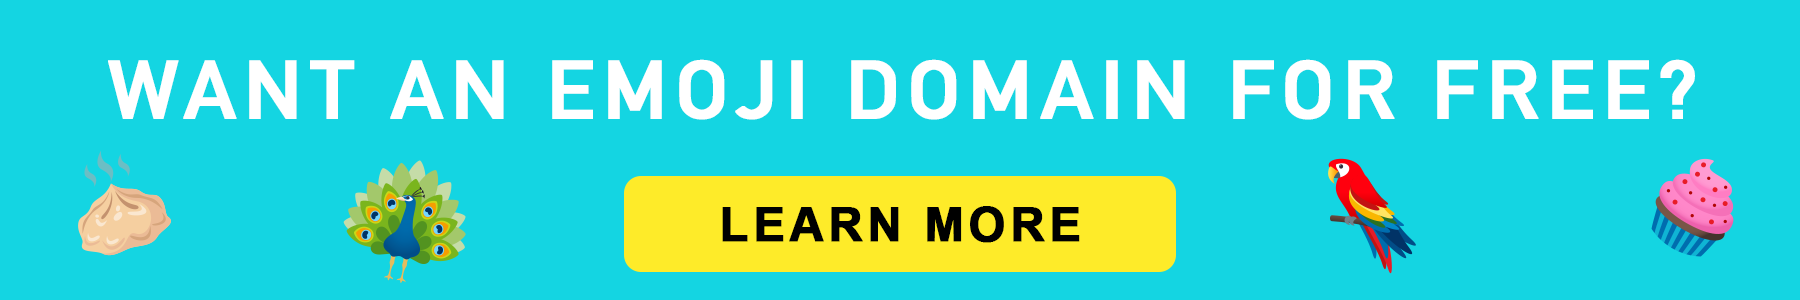 free emoji domain banner.png